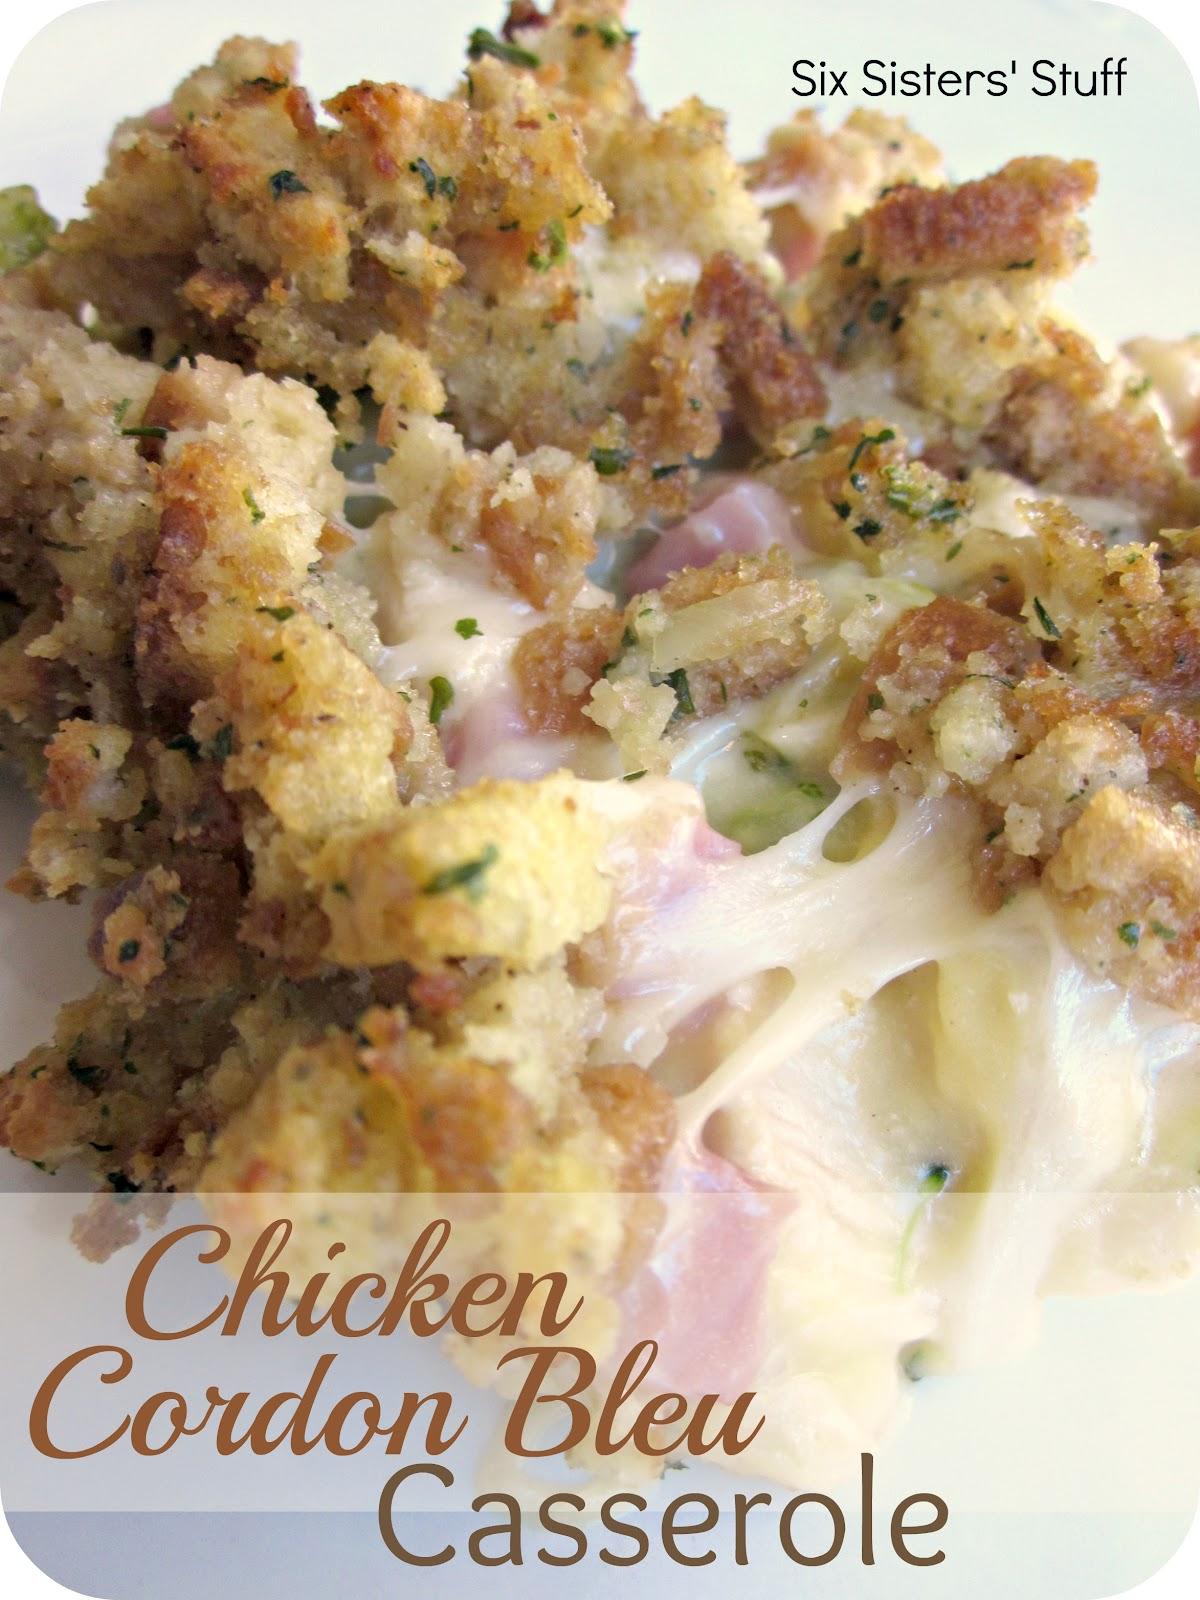 Six Sisters' Stuff: Chicken Cordon Bleu Casserole Recipe ⋆ PinPoint